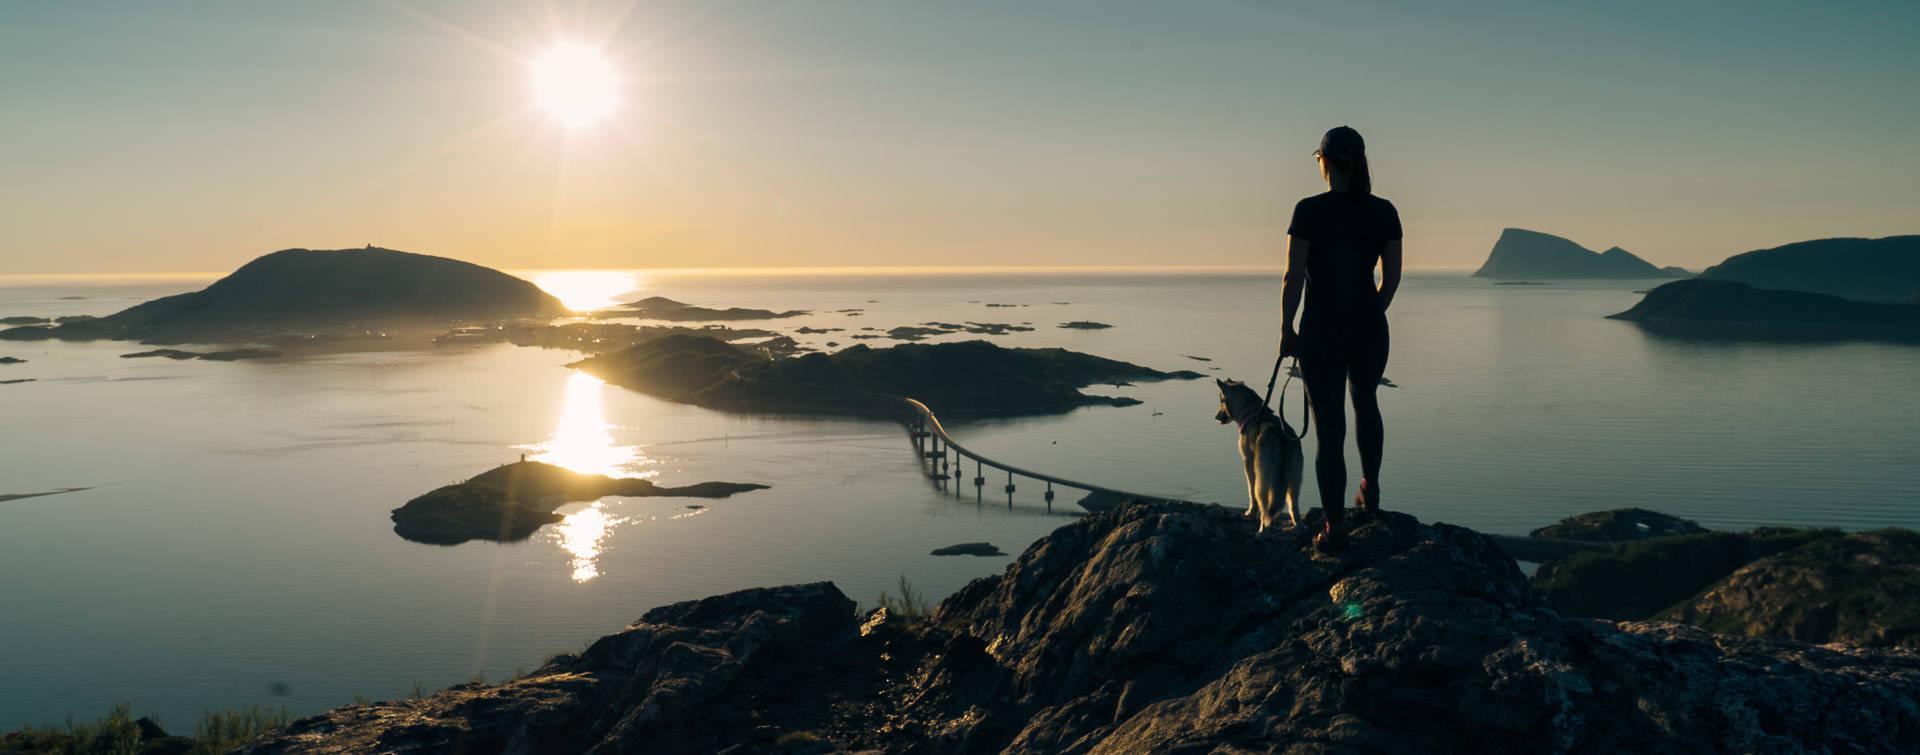 Ornfloya Tromso